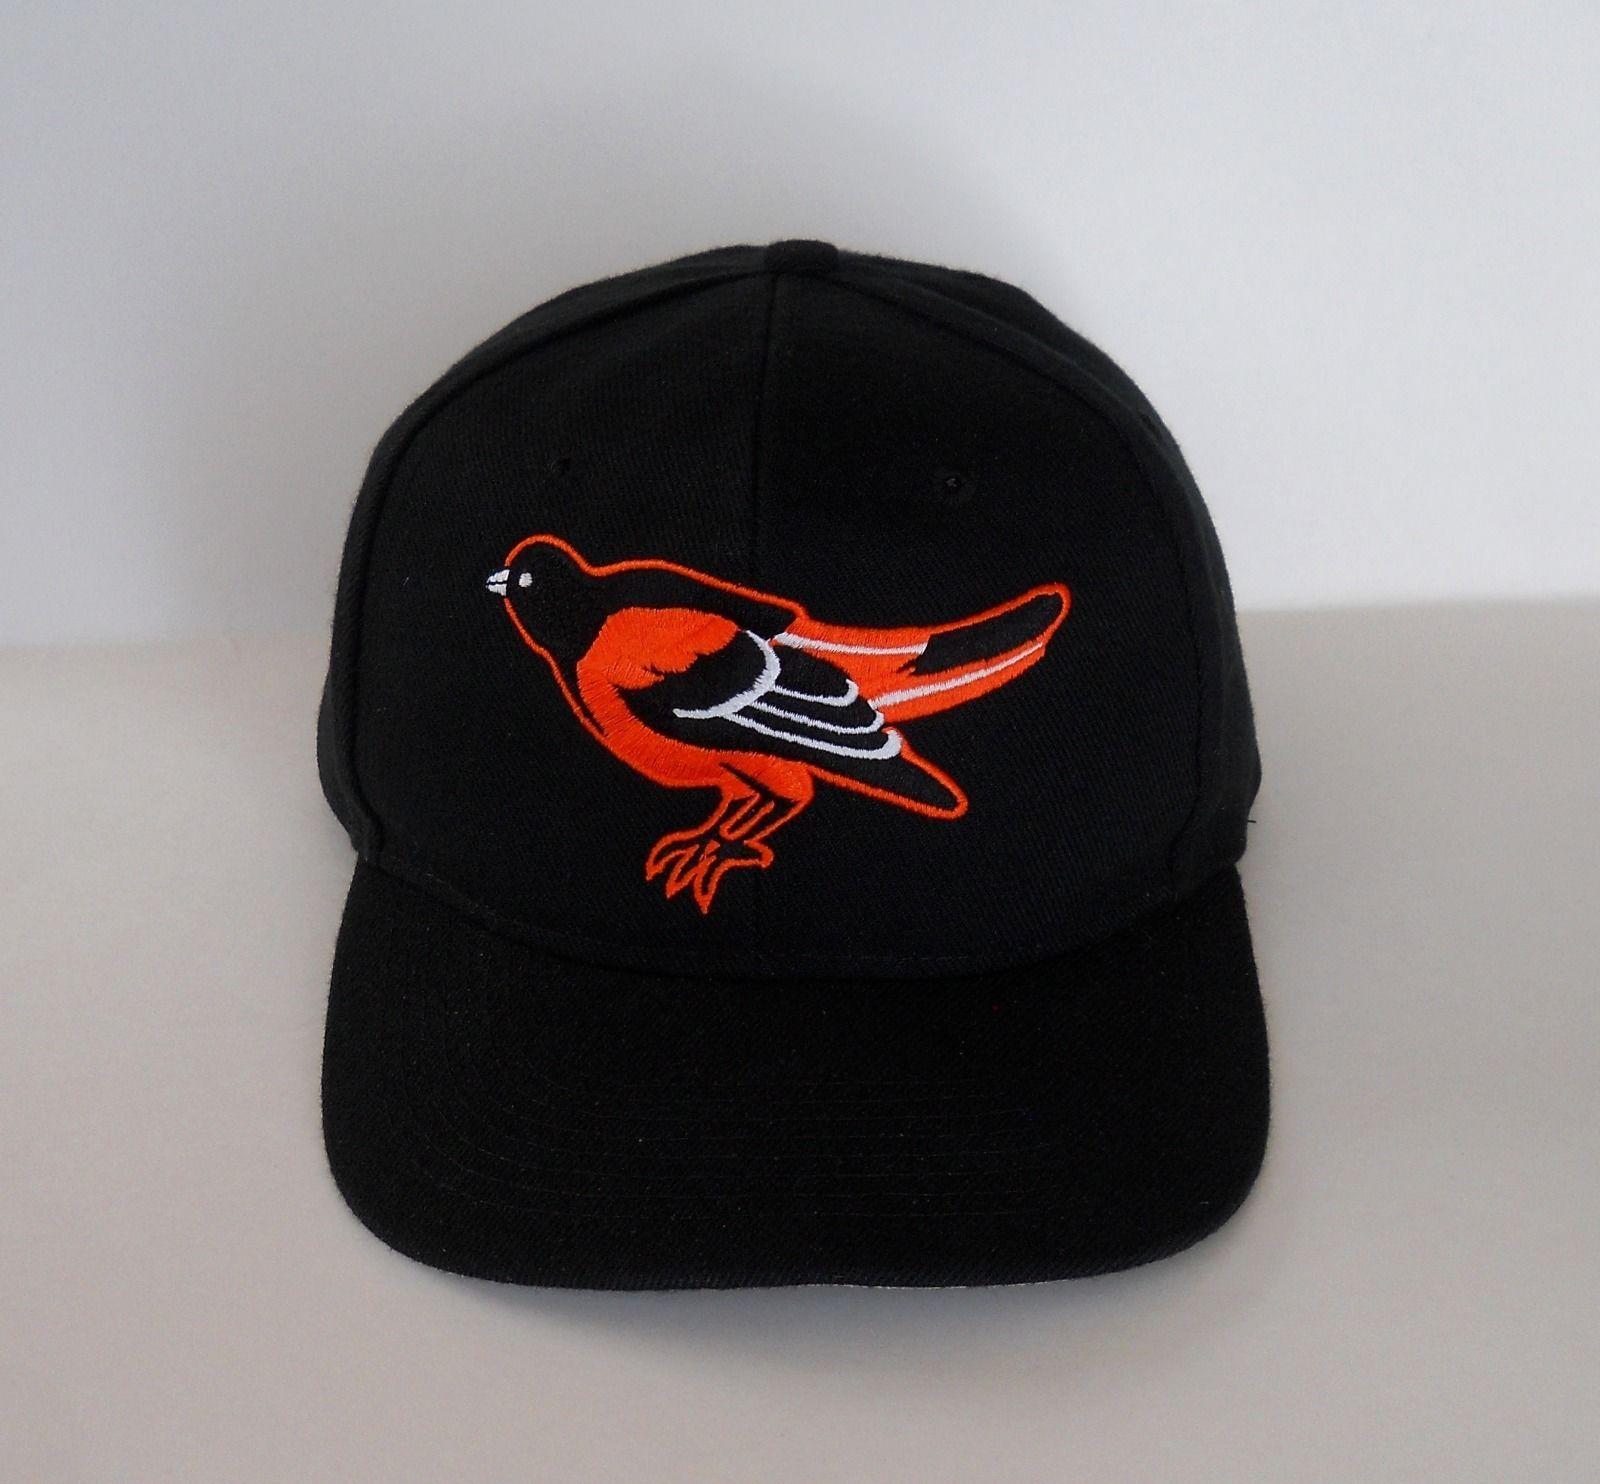 Details about Vintage arizona diamondbacks Hat Cap Snapback